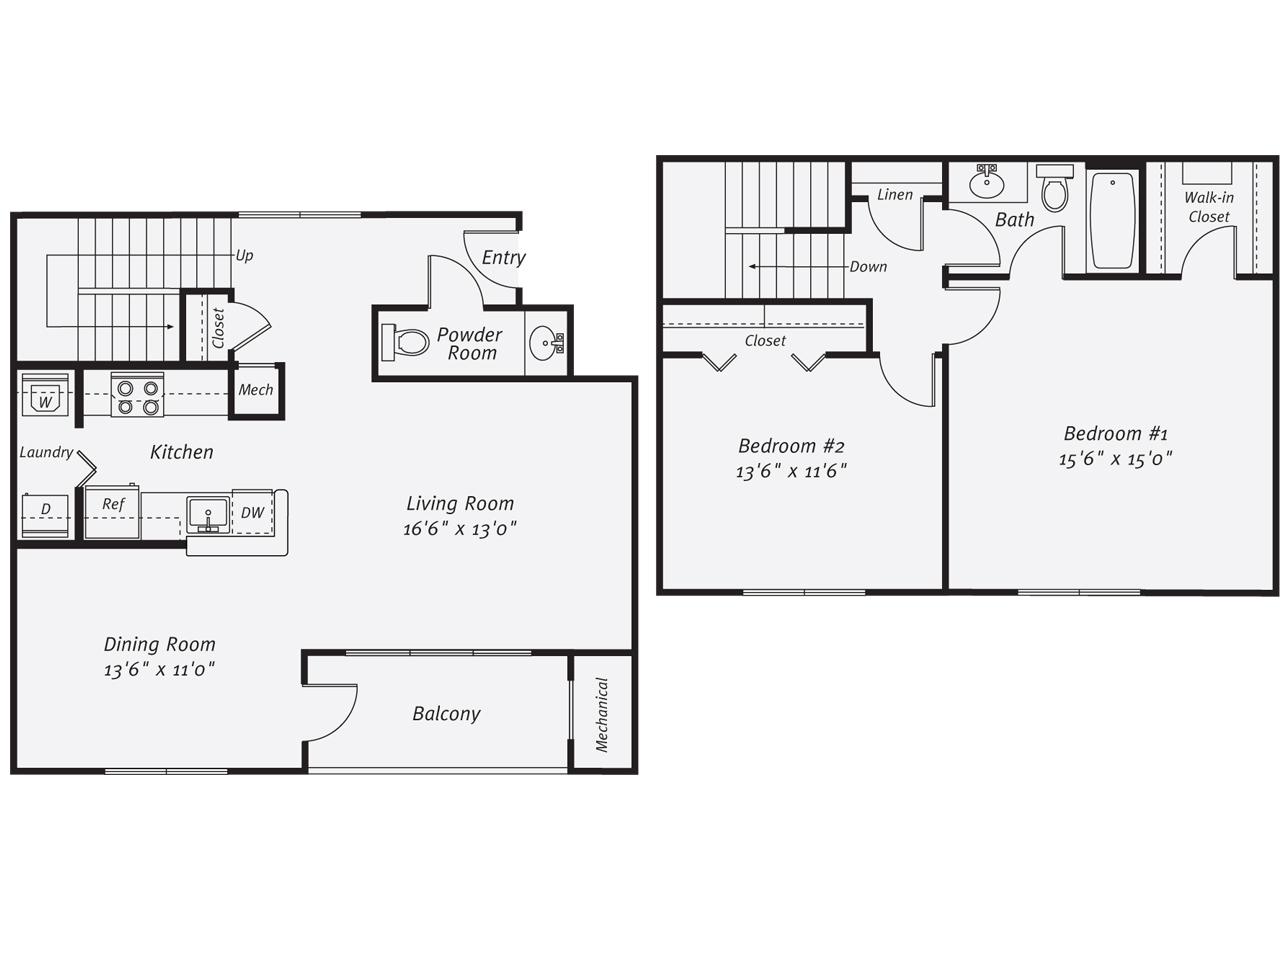 Ny coram thepointatpineridge p0571769 ny014 bt4 2 floorplan